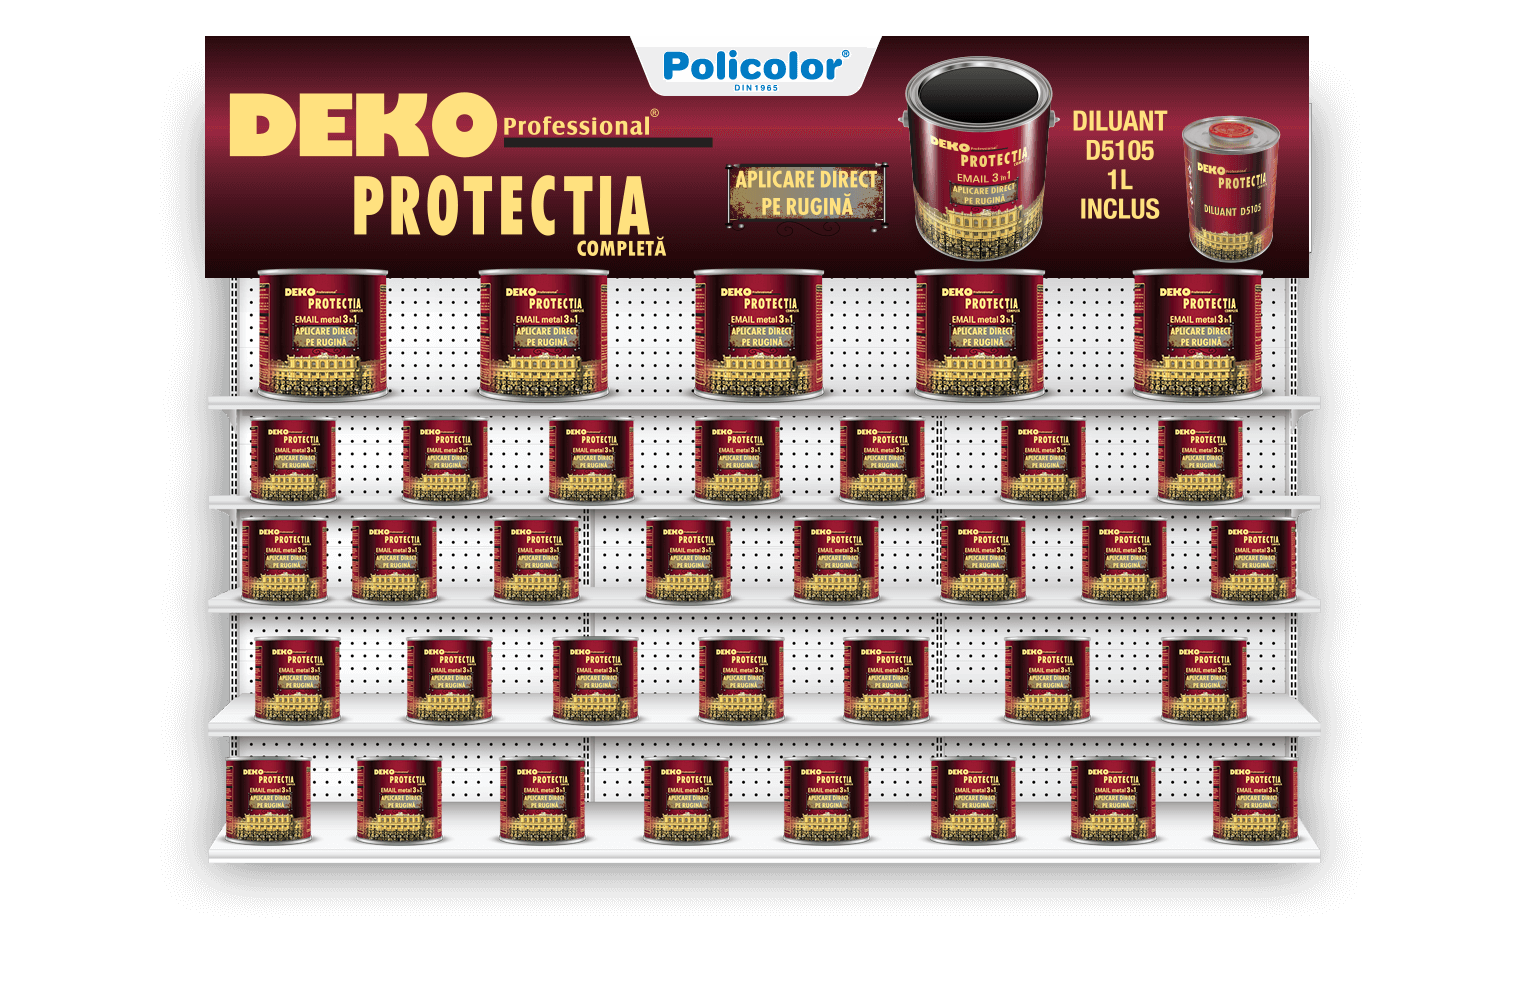 policolor_deko-protectia